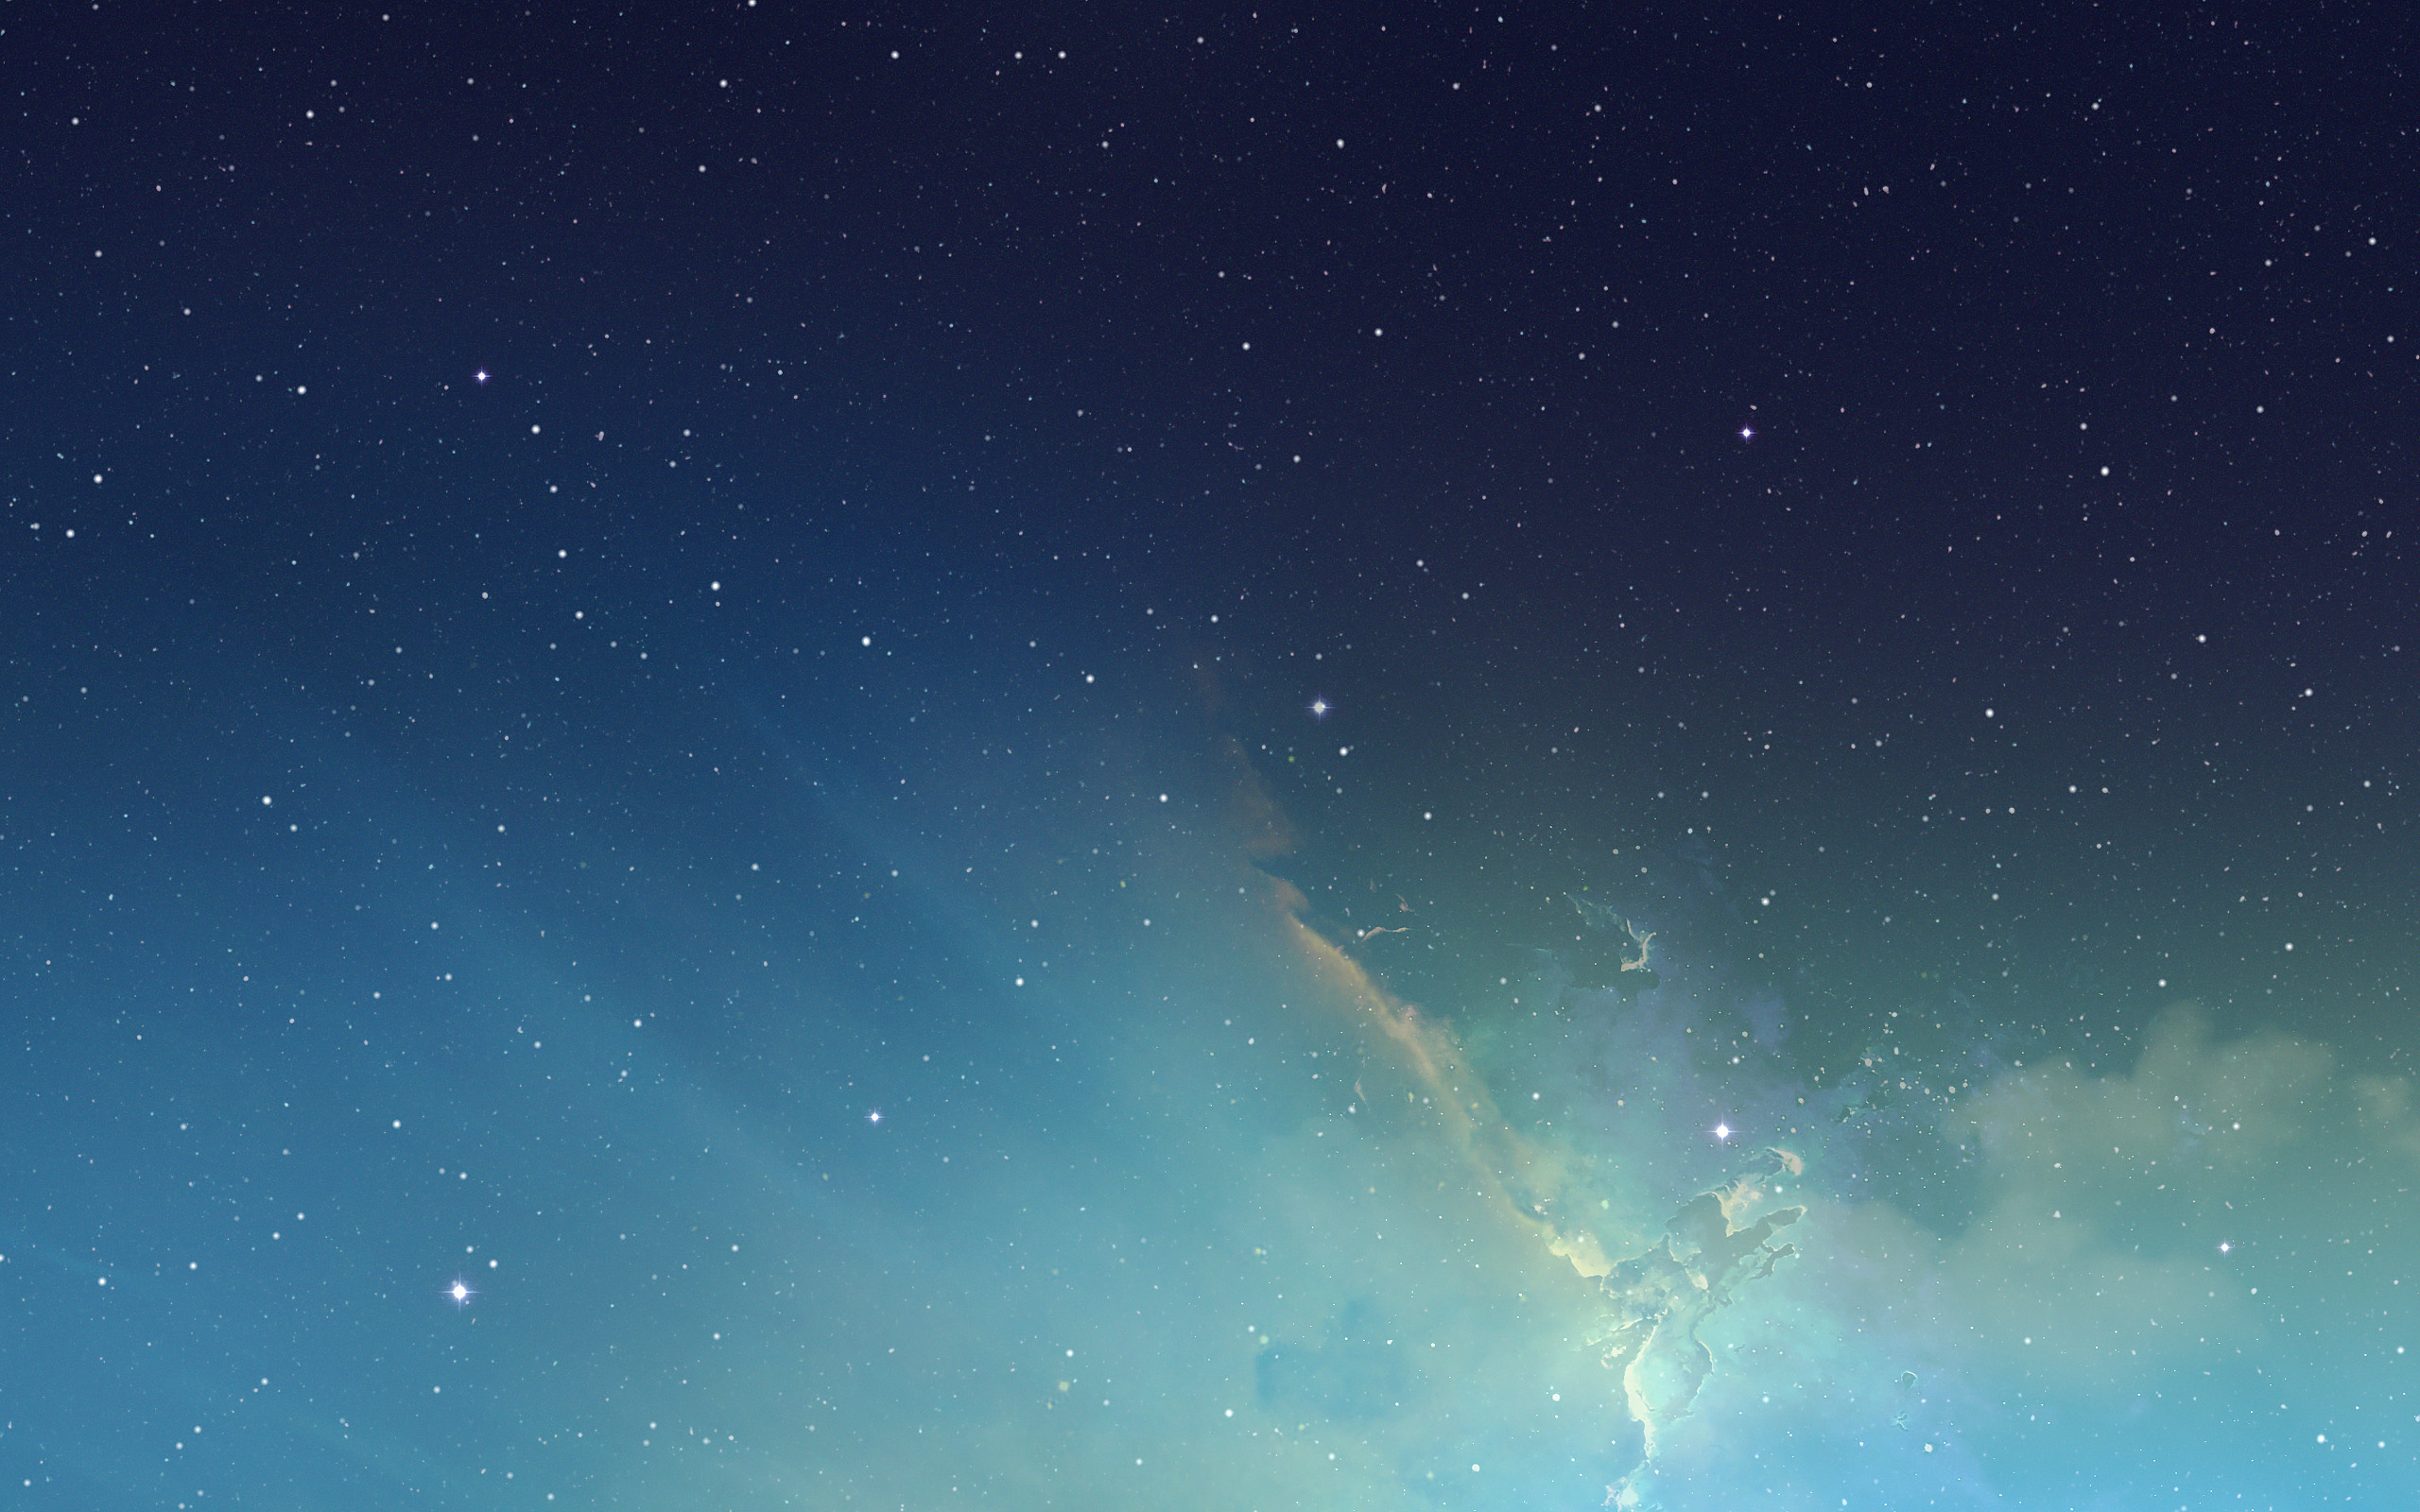 iOS 7 Nebula by filipe-ps, ios, mac, apple, space, wallpaper, nebula, stars